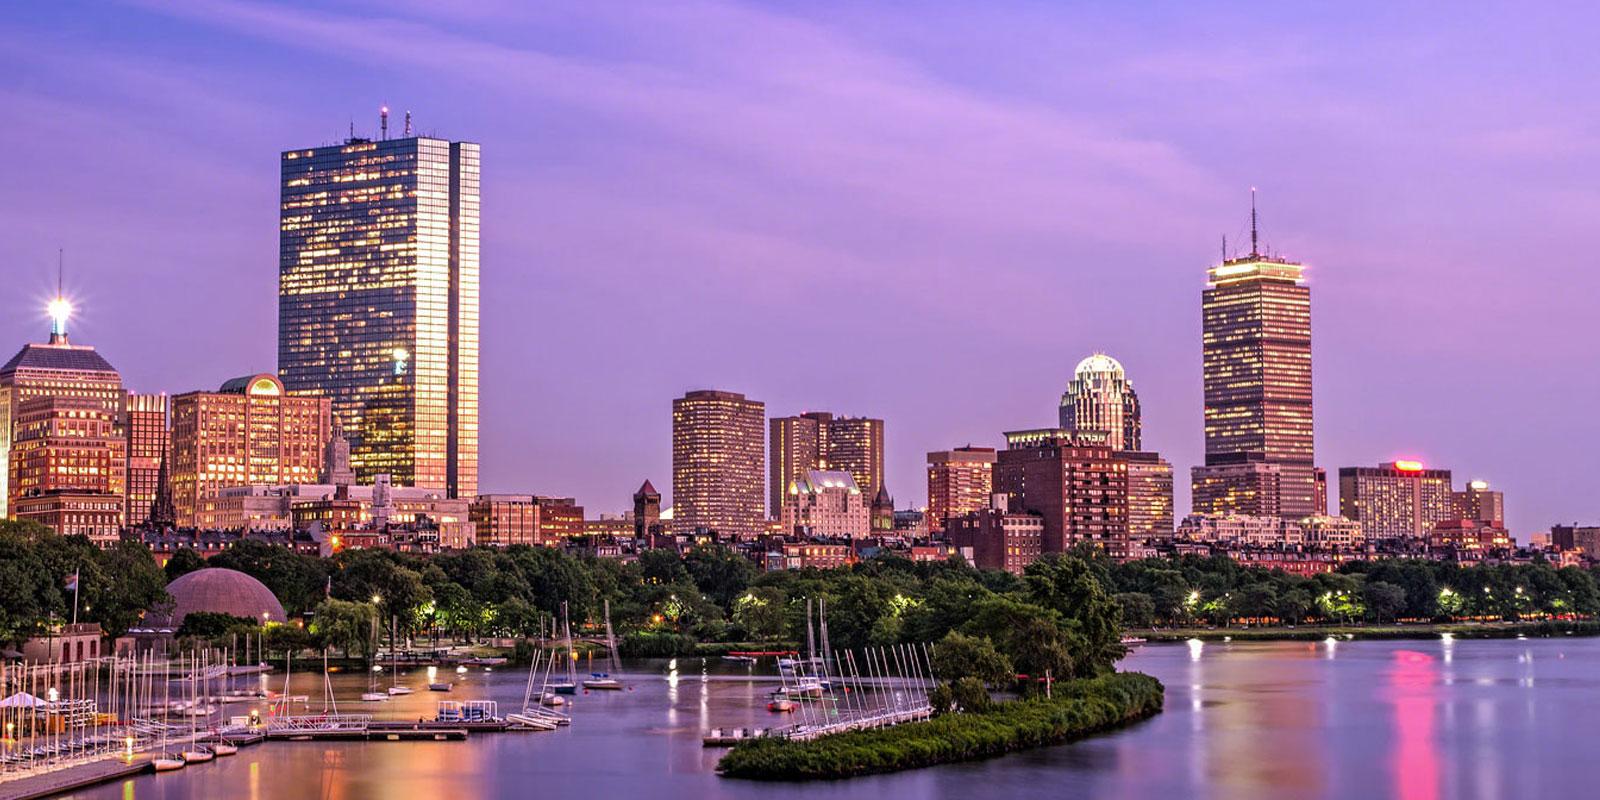 Smart City Innovation Accelerator: Harvard - May 2019